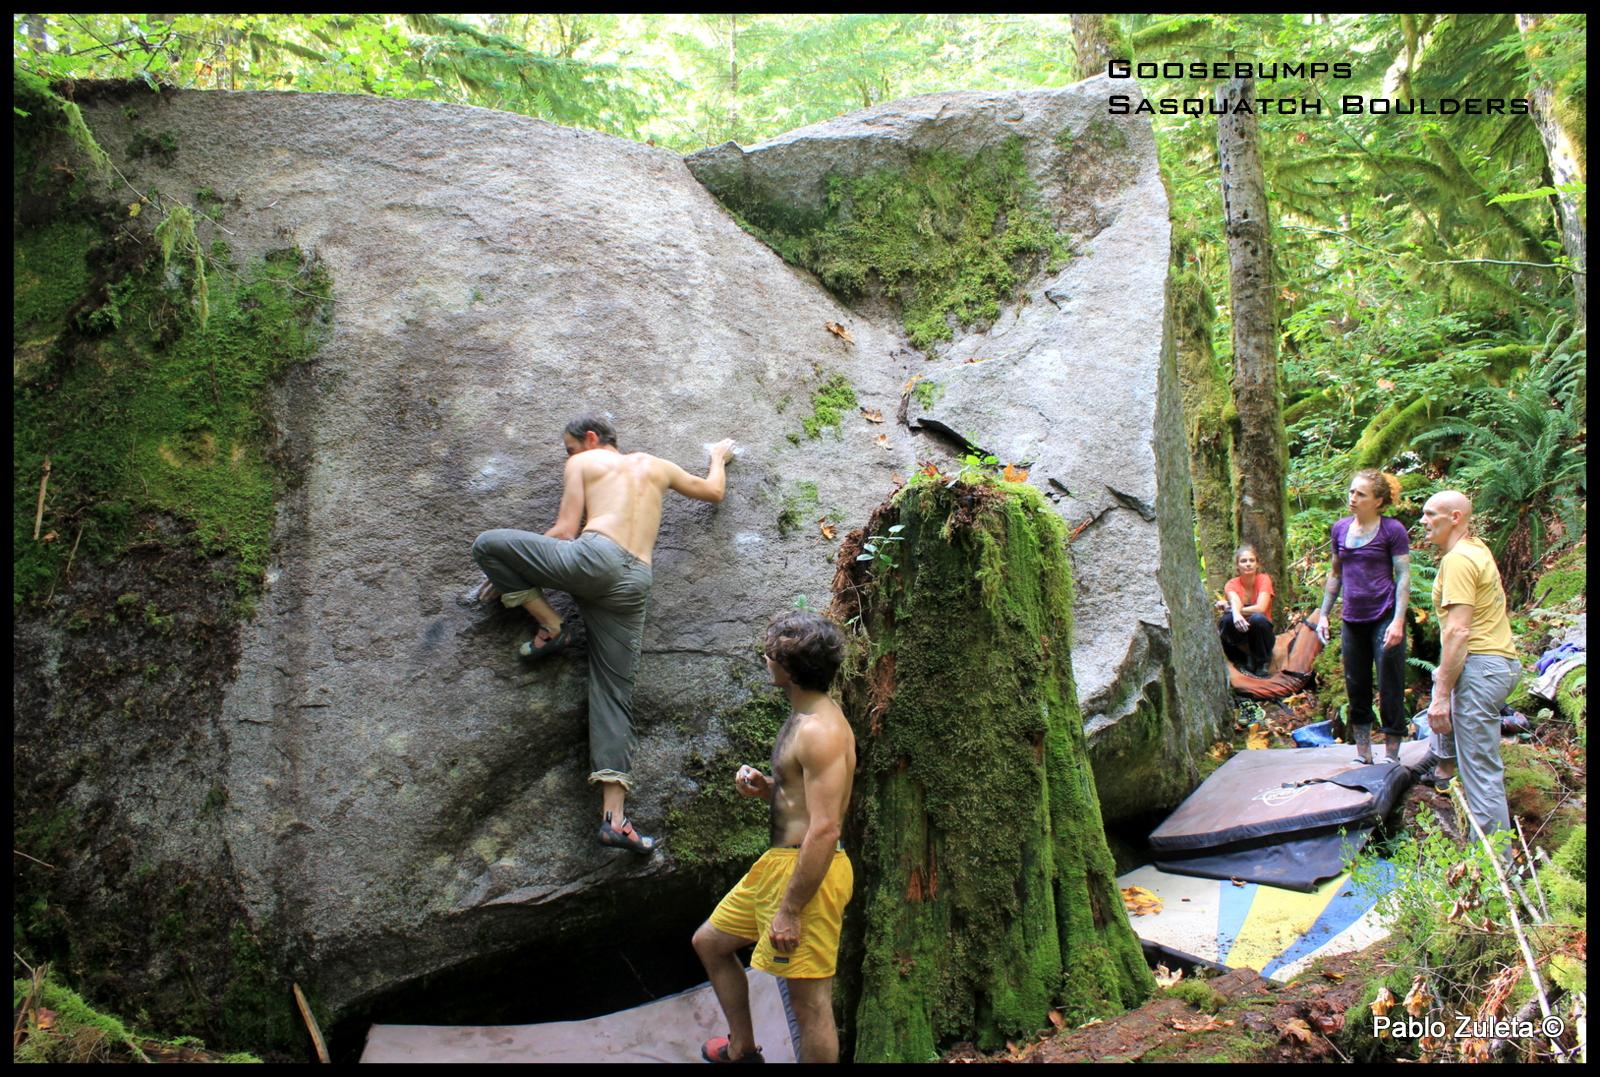 Dan Erikson climbing Goosebumps another new slab line.